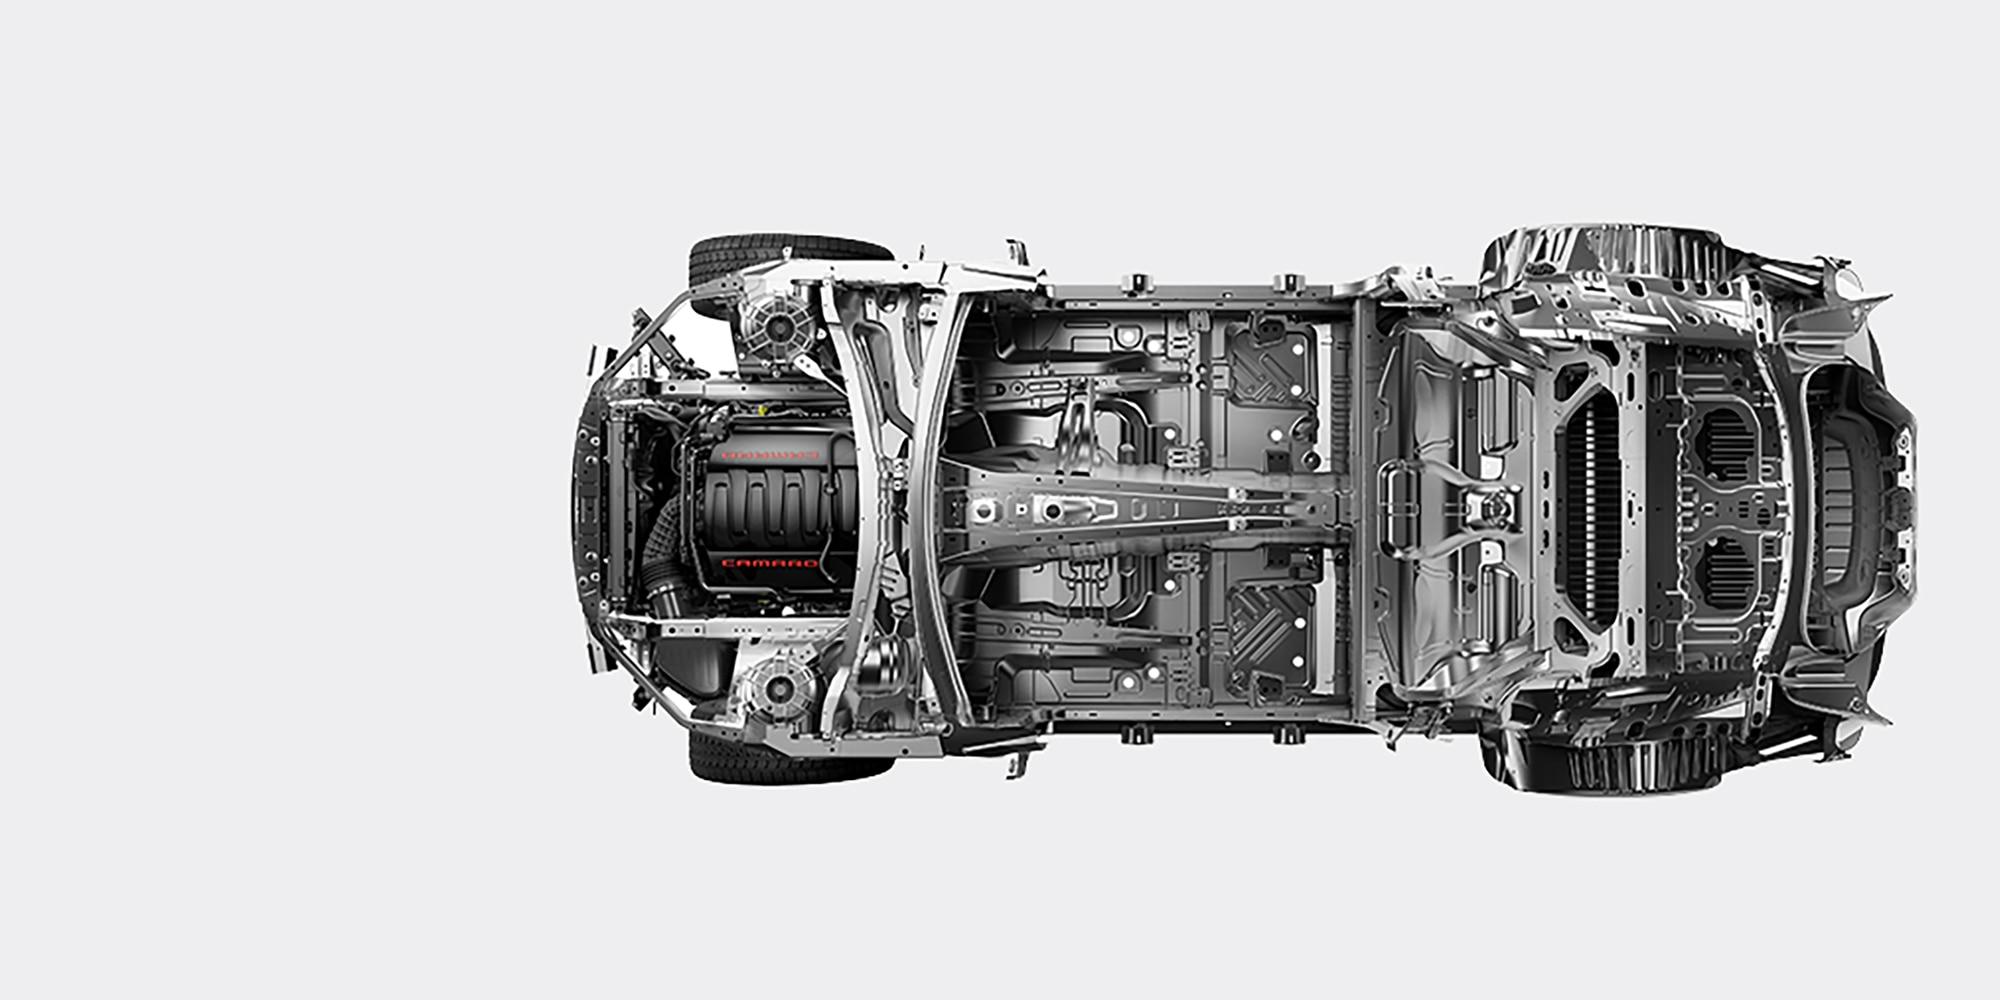 Desempeño del auto deportivo Camaro 2018: arquitectura